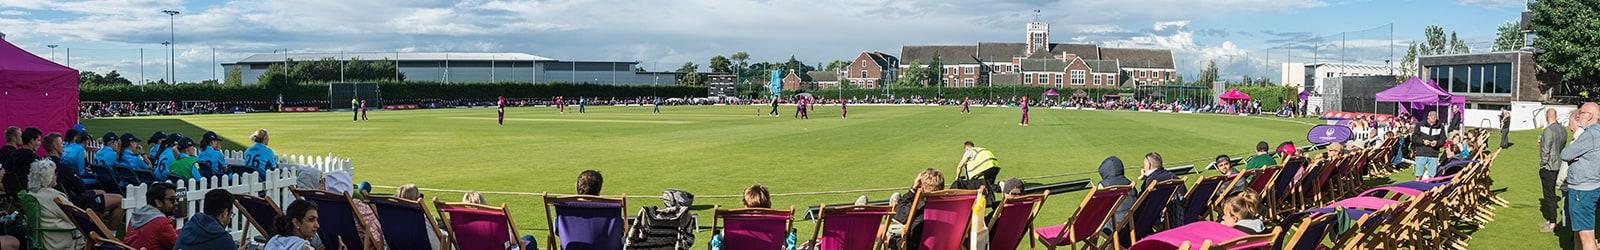 Loughborough Sport Cricket